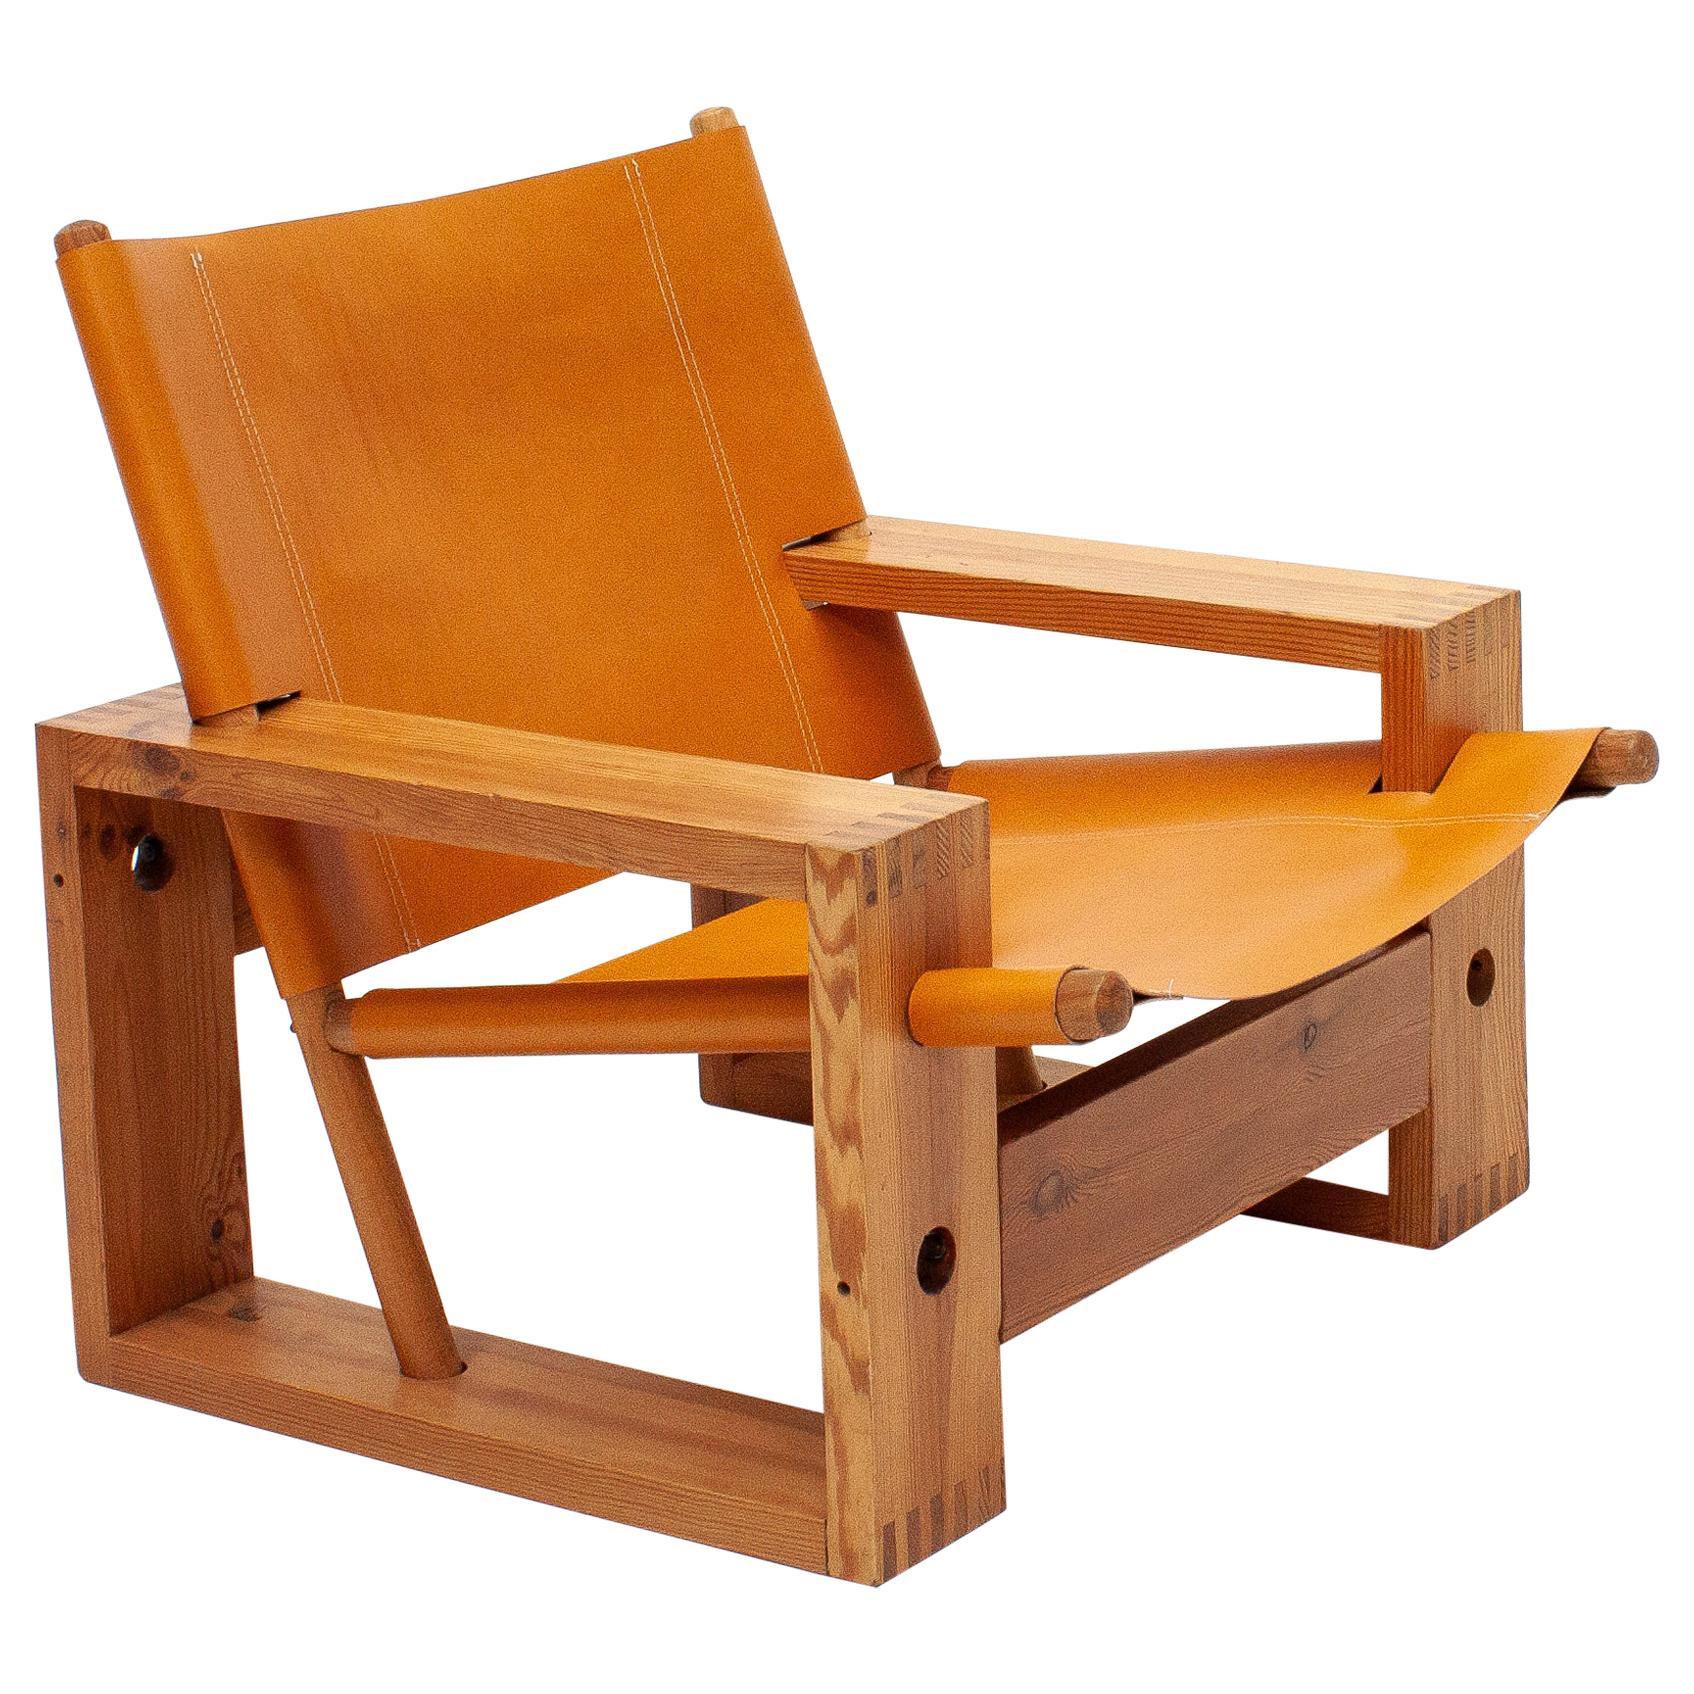 Ate Van Apeldoorn Dutch Midcentury Easy Chair for Houtwerk Hattem, 1970s